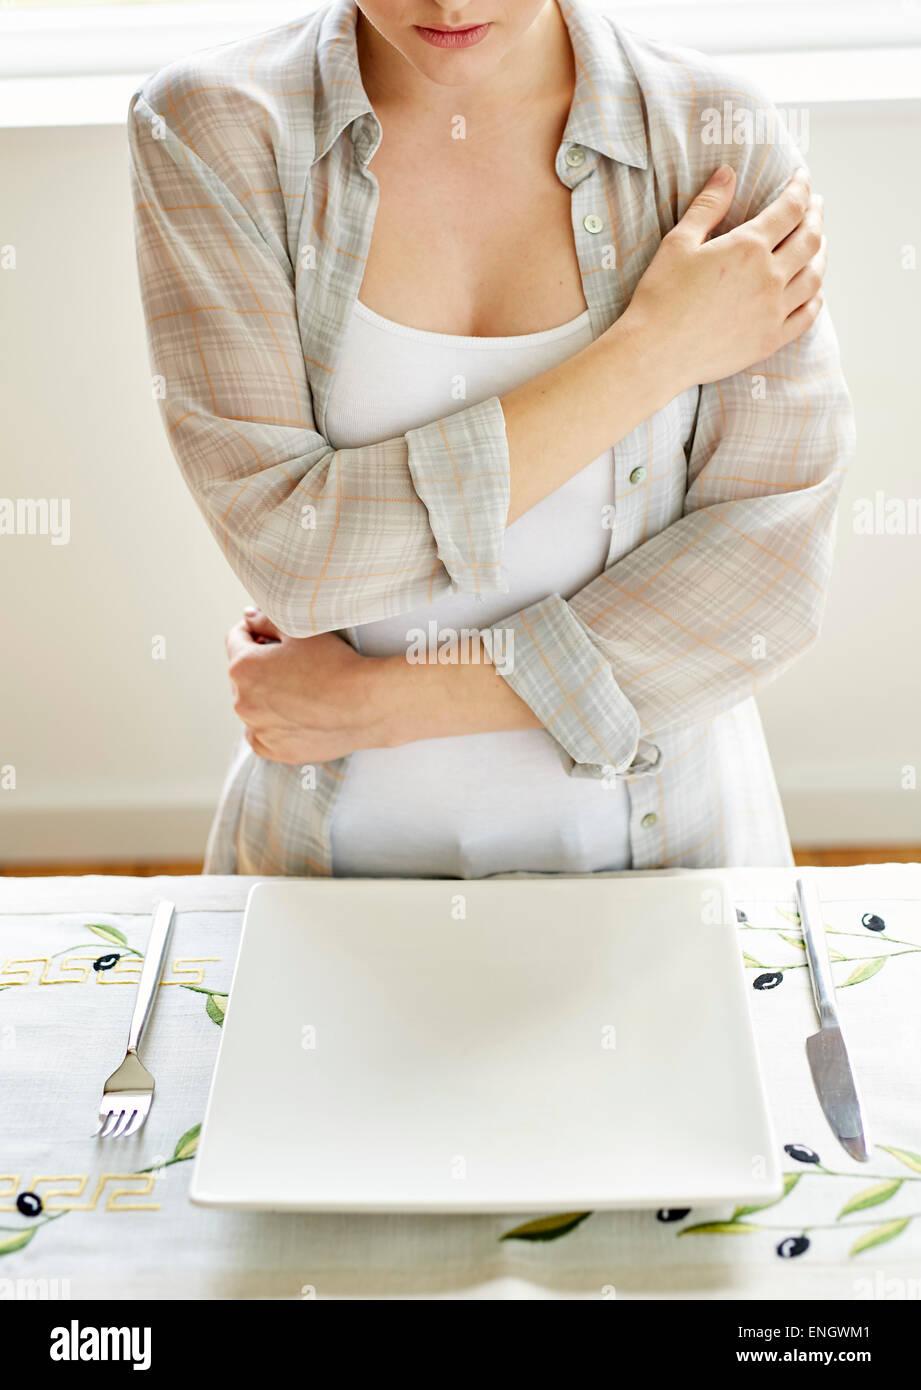 Femme refusant la nourriture Photo Stock